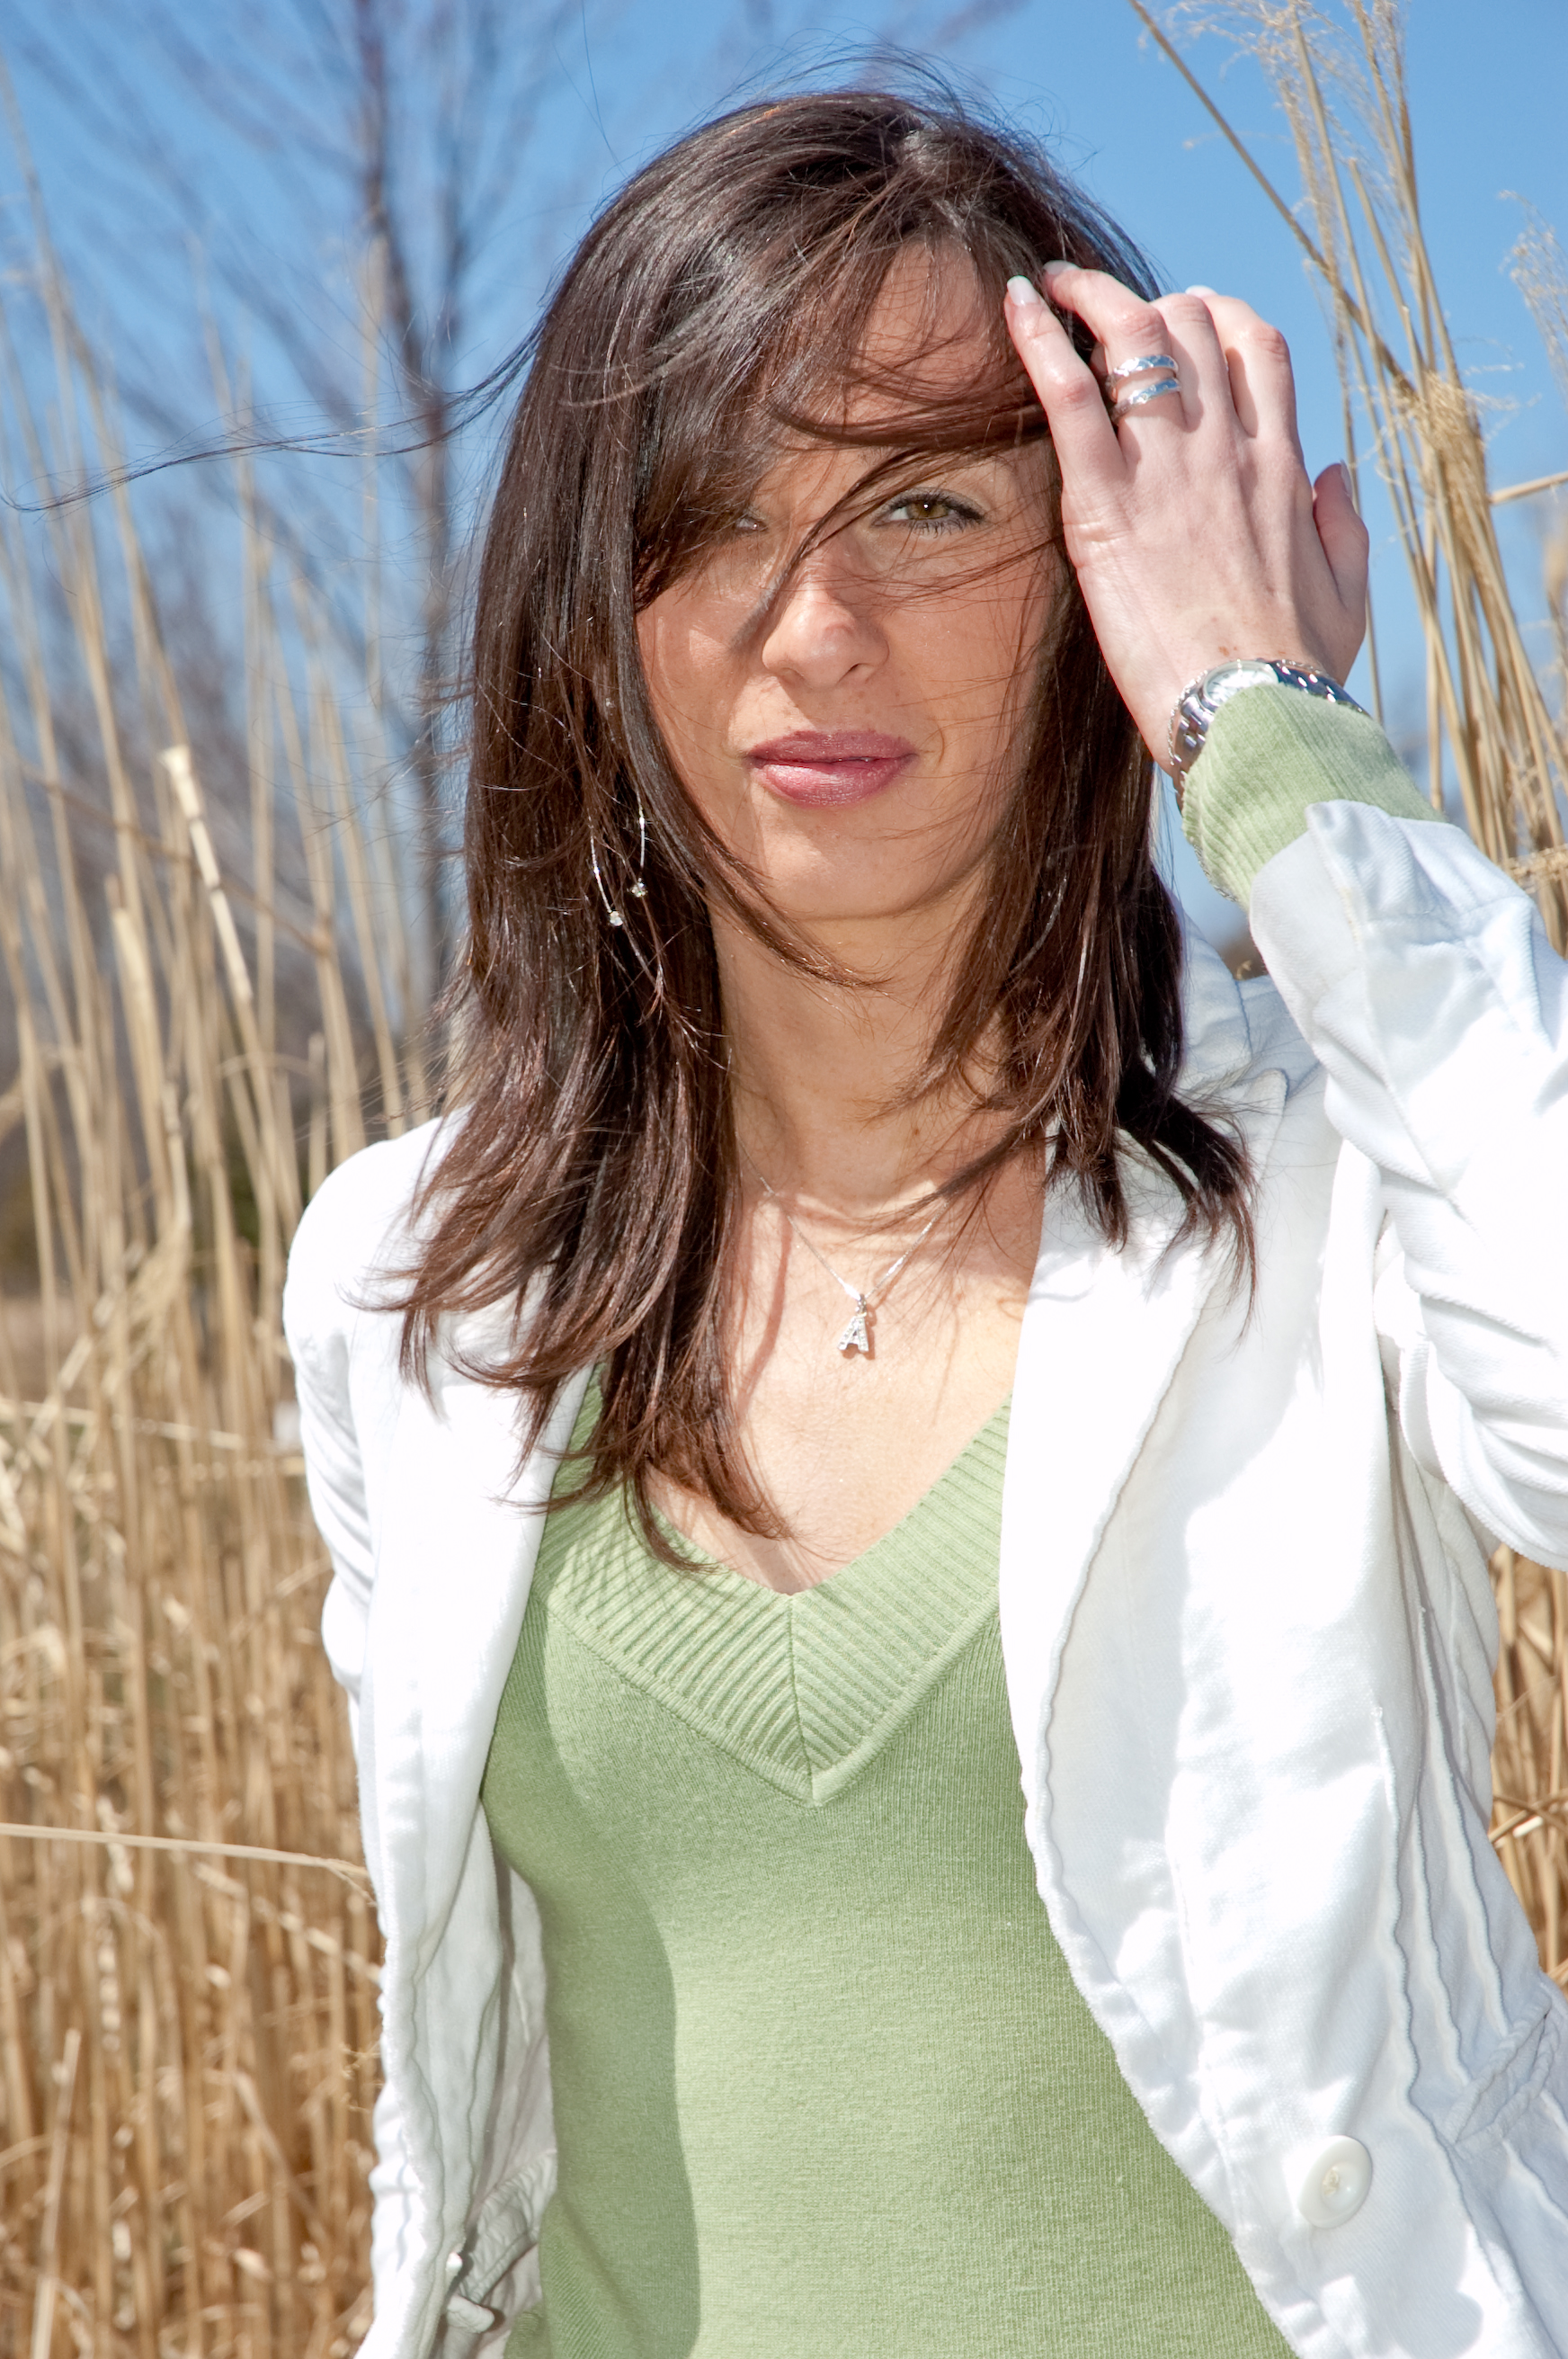 AmandaFerguson_20060408_2299.jpg